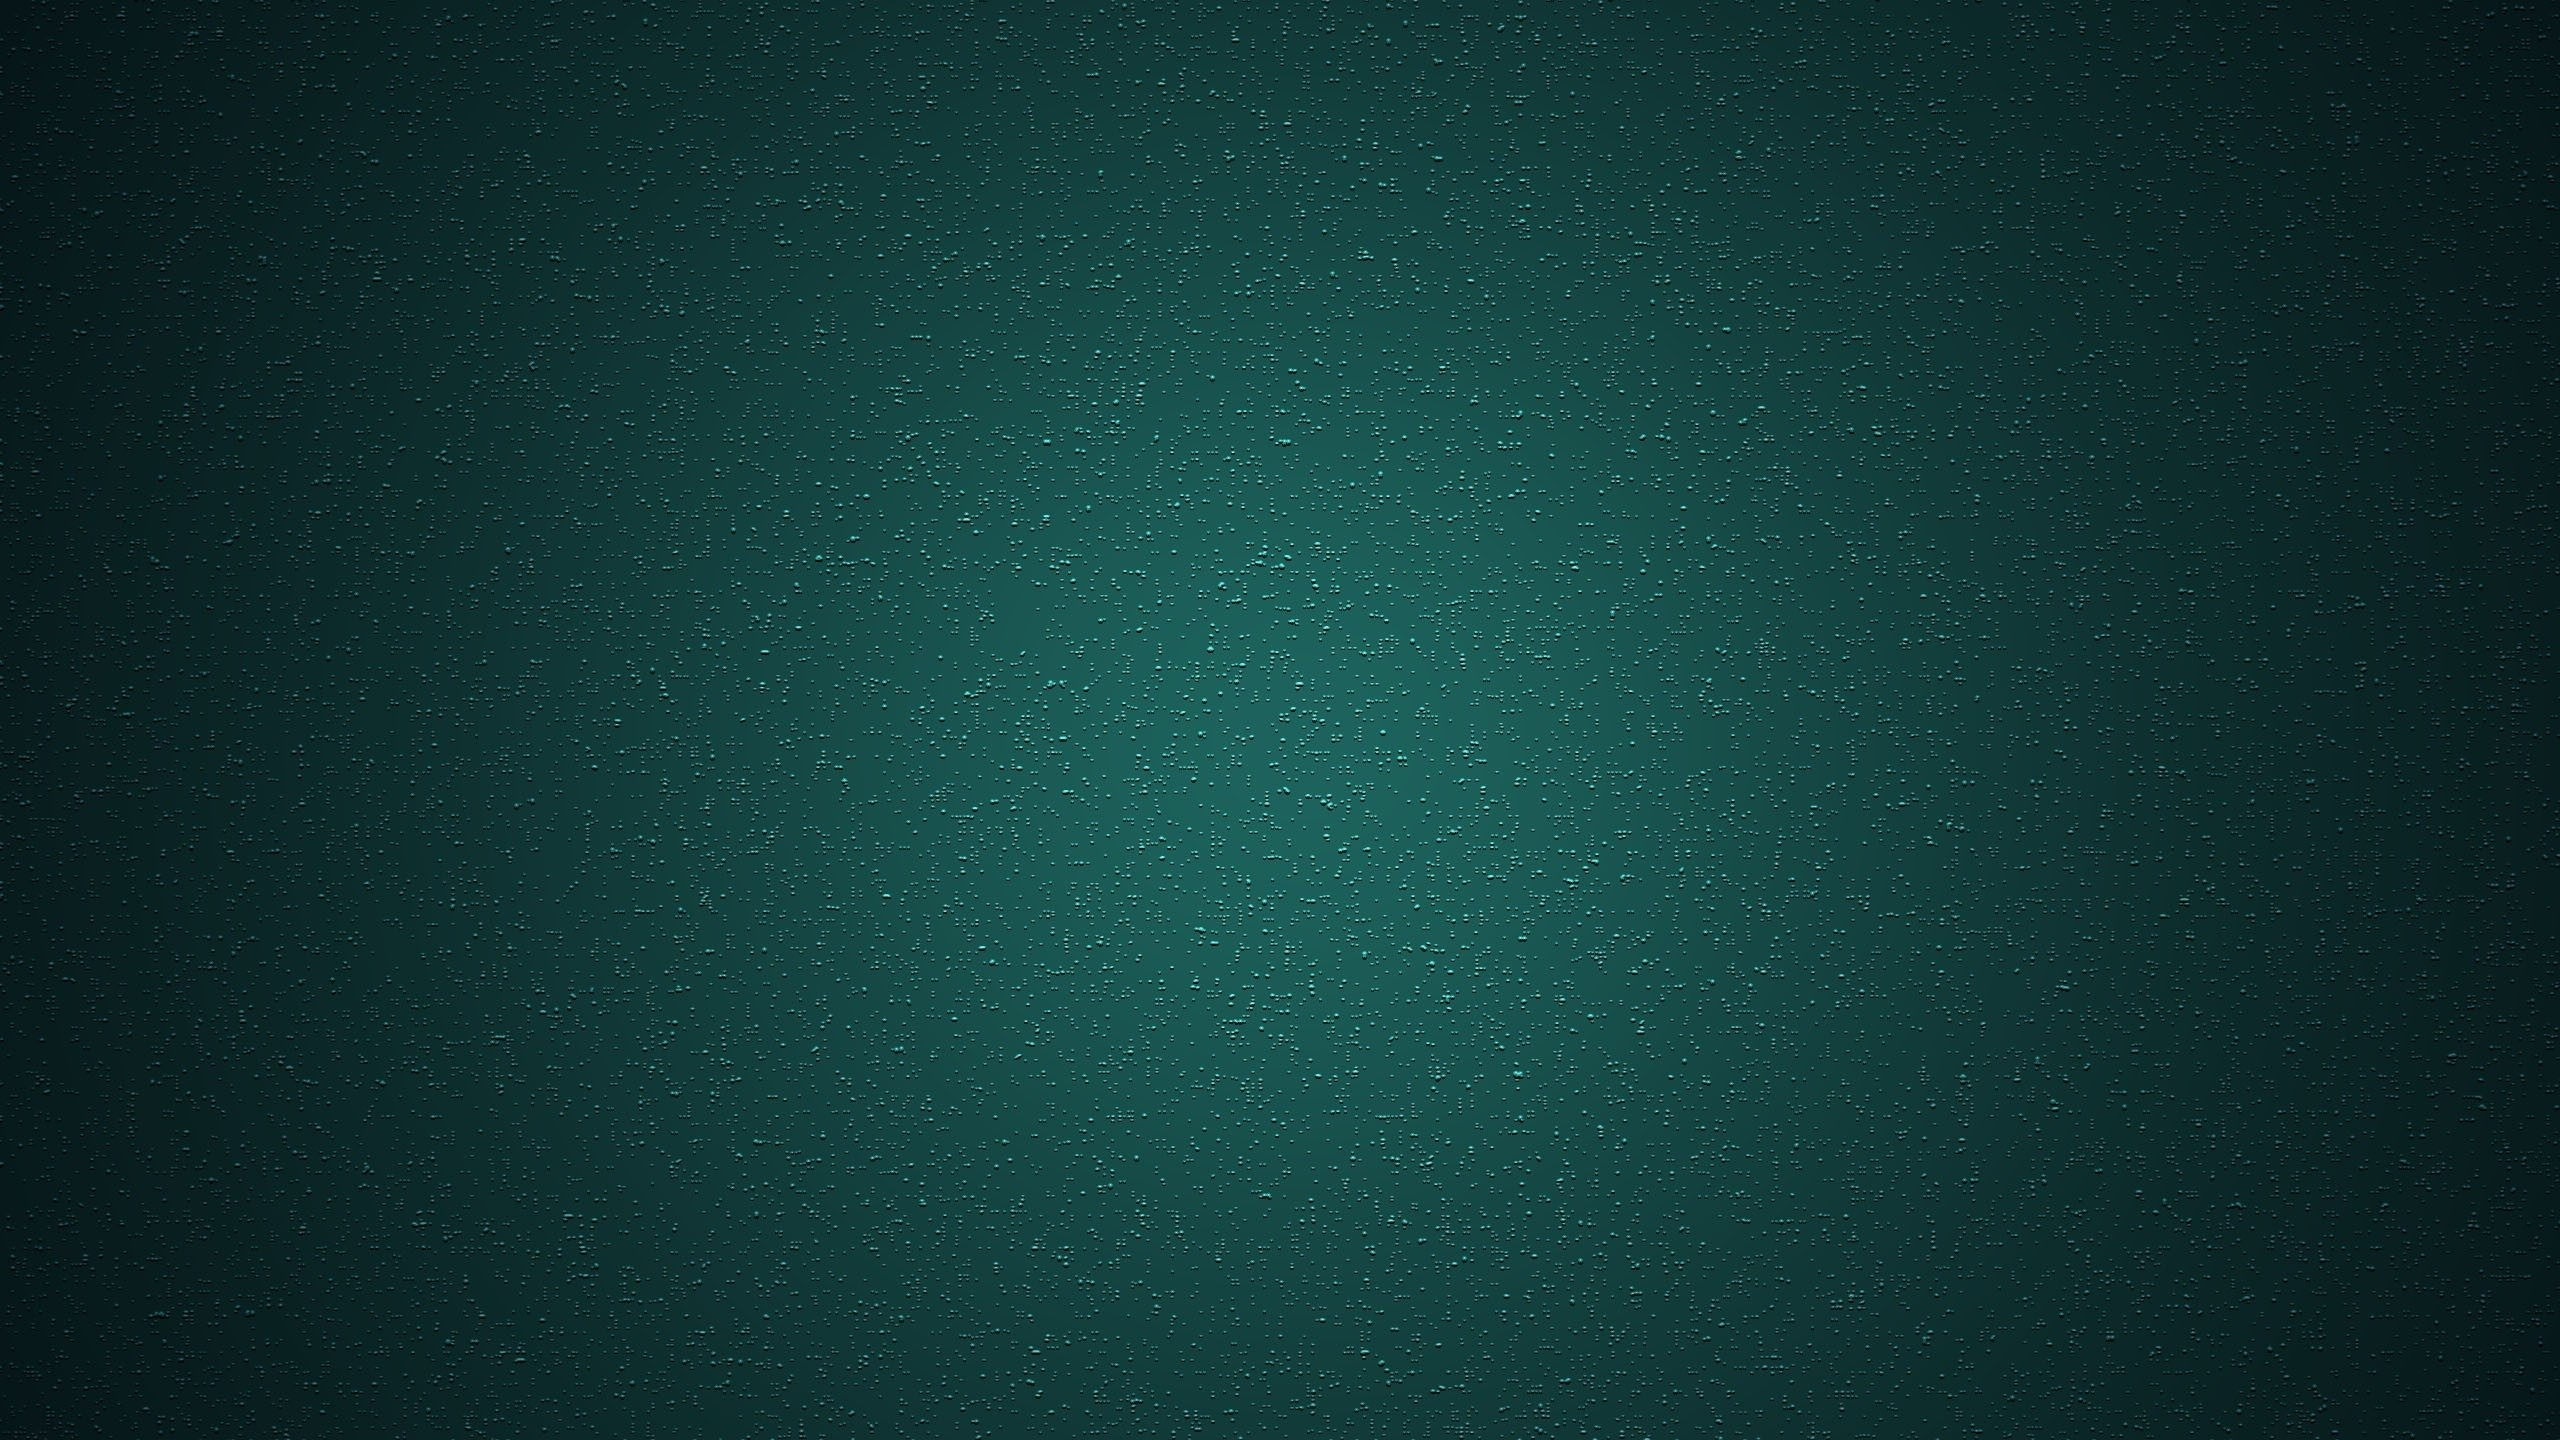 Description: Download Green dark textures simple background wallpaper/desktop  background in HD & Widescreen resolution.